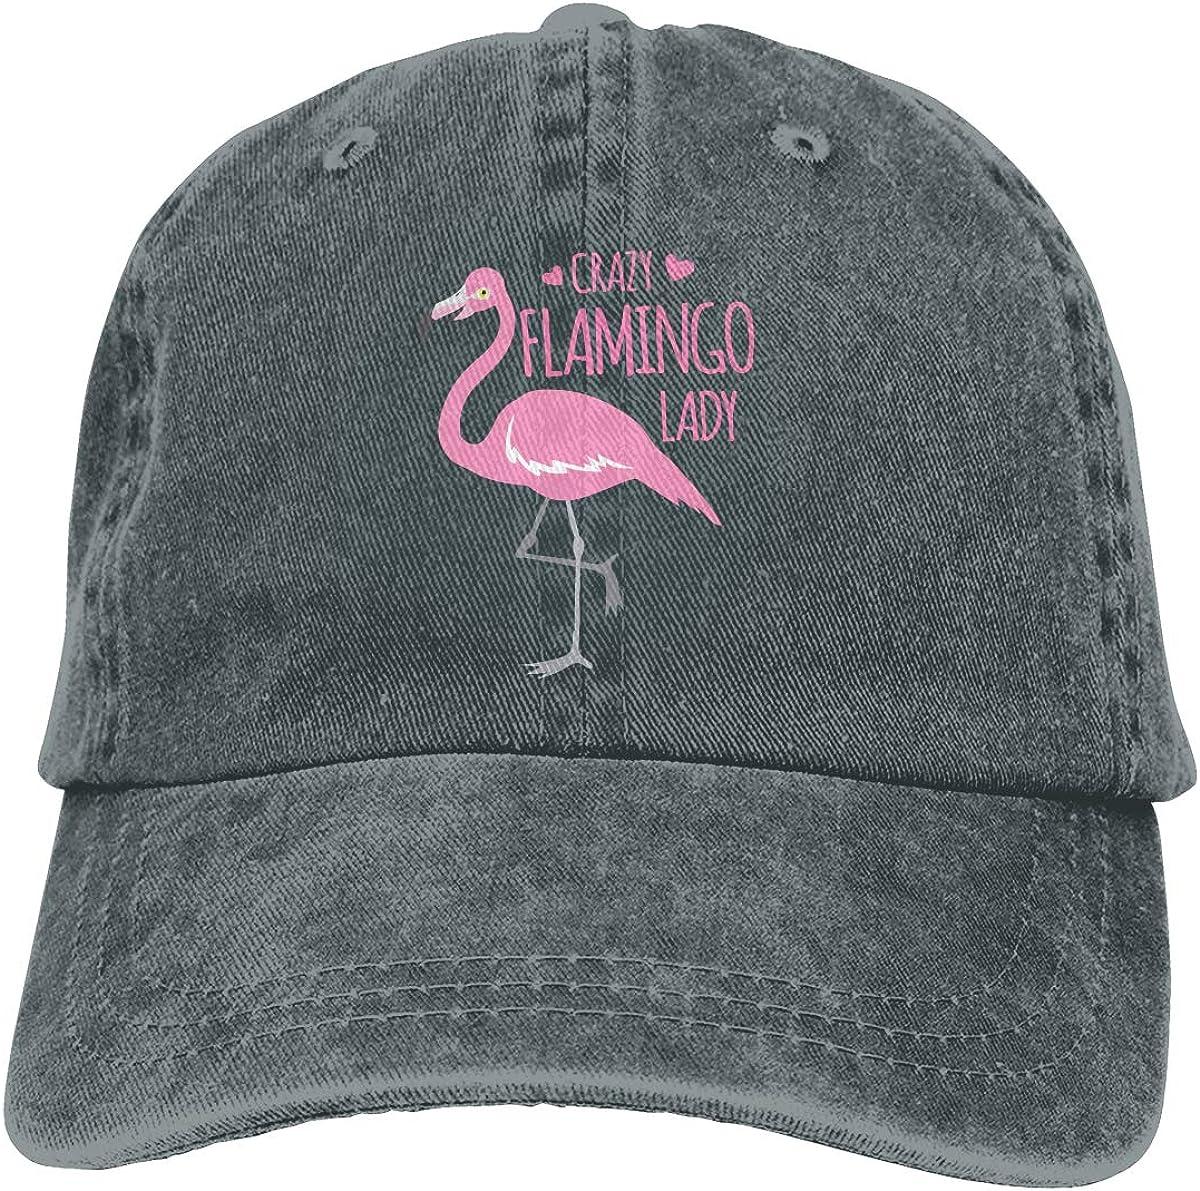 Crazy Flamingo Lady Popular Unisex Washed Cap Adjustable Dads Denim Stetson Hat